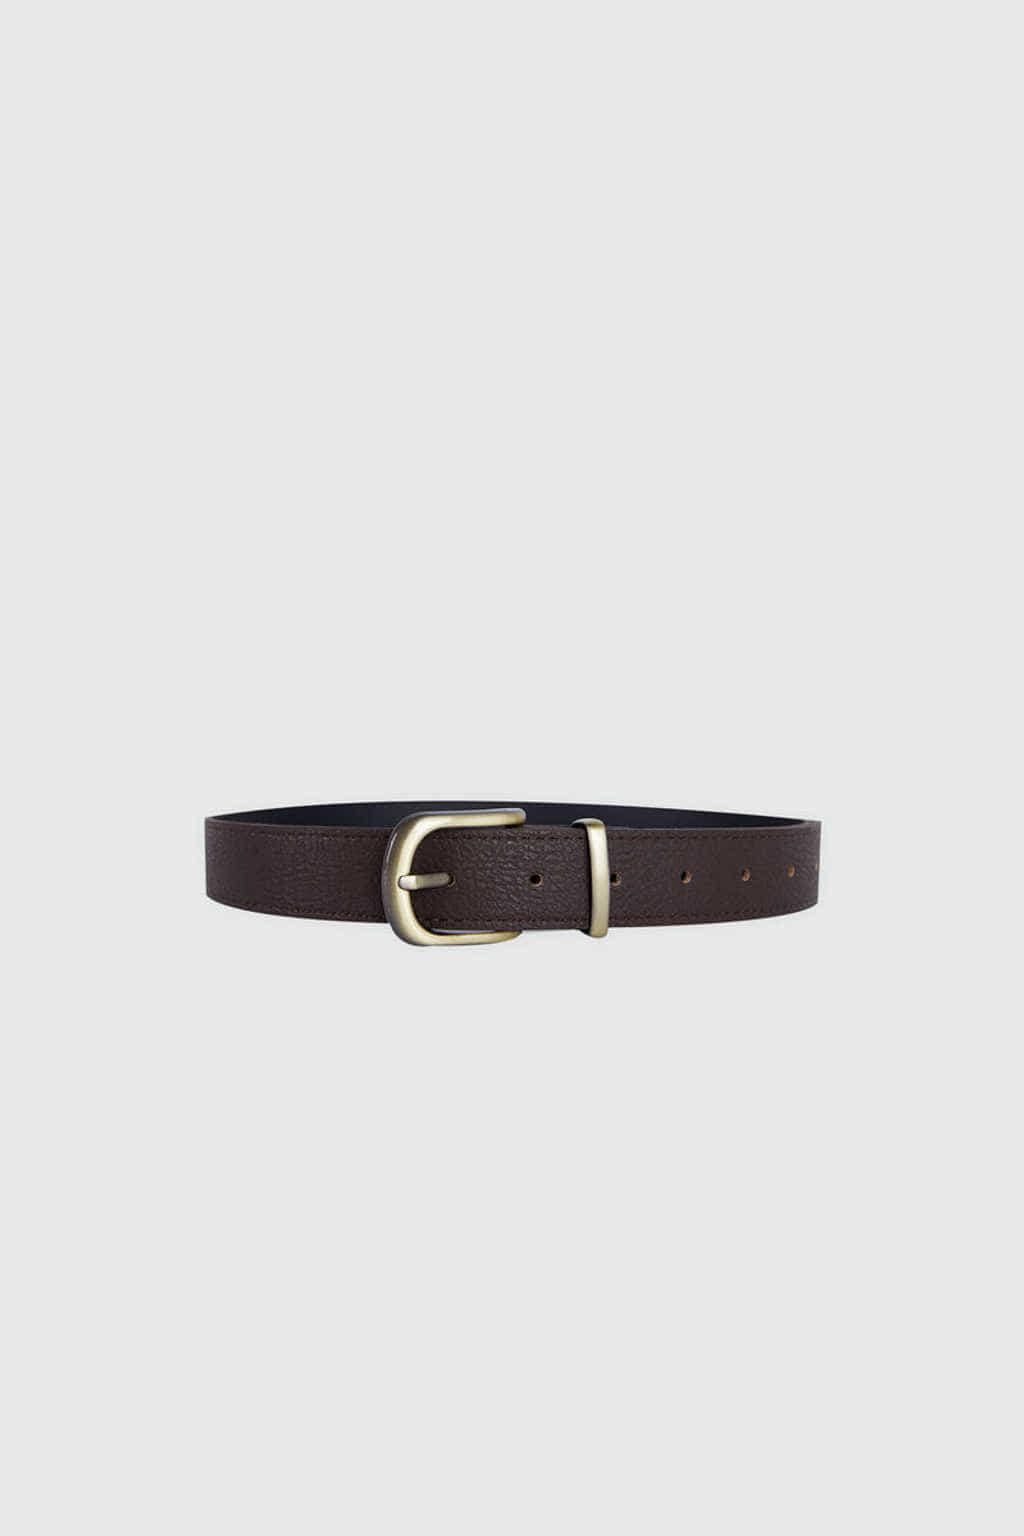 Belt J017 Brown 2